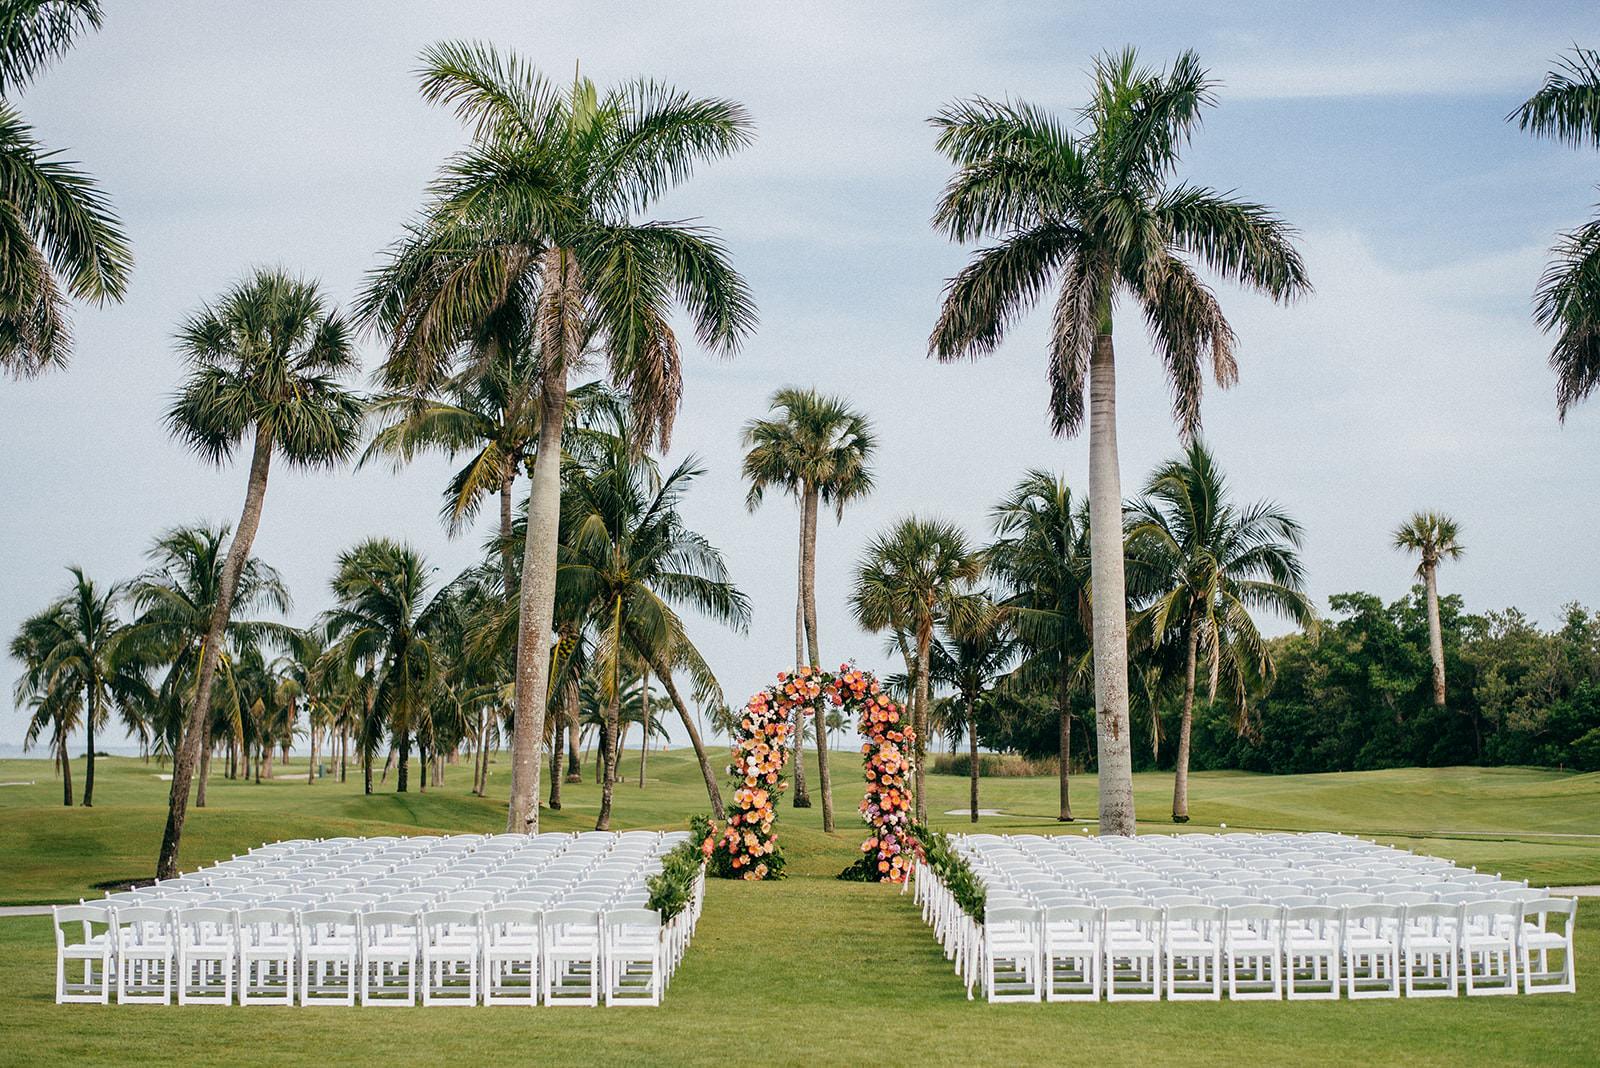 Tropical Wedding Ceremony Decor, Colorful Pink and Coral Floral Arch   Boca Grande Wedding Venue Gasparilla Inn   Tampa Bay Wedding Planner NK Weddings